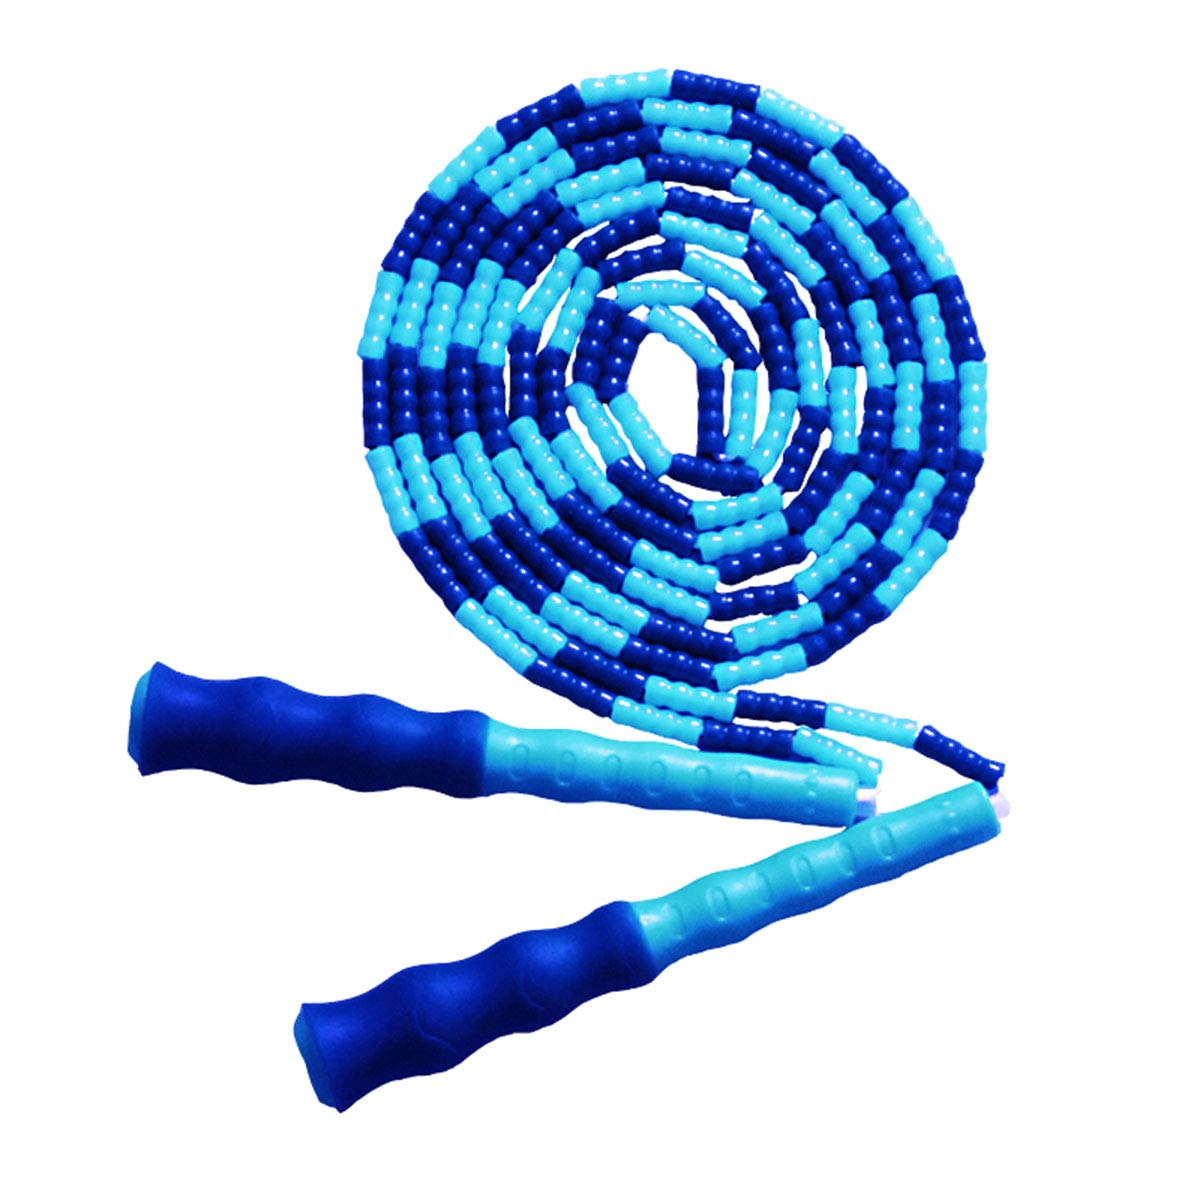 LETUSPORT 9 Feet Adjustable Beaded Segmented Jump Rope for Women Men Kids Lightweight Work Out Speed Jumping Ropes (Blue, 1 pcs)